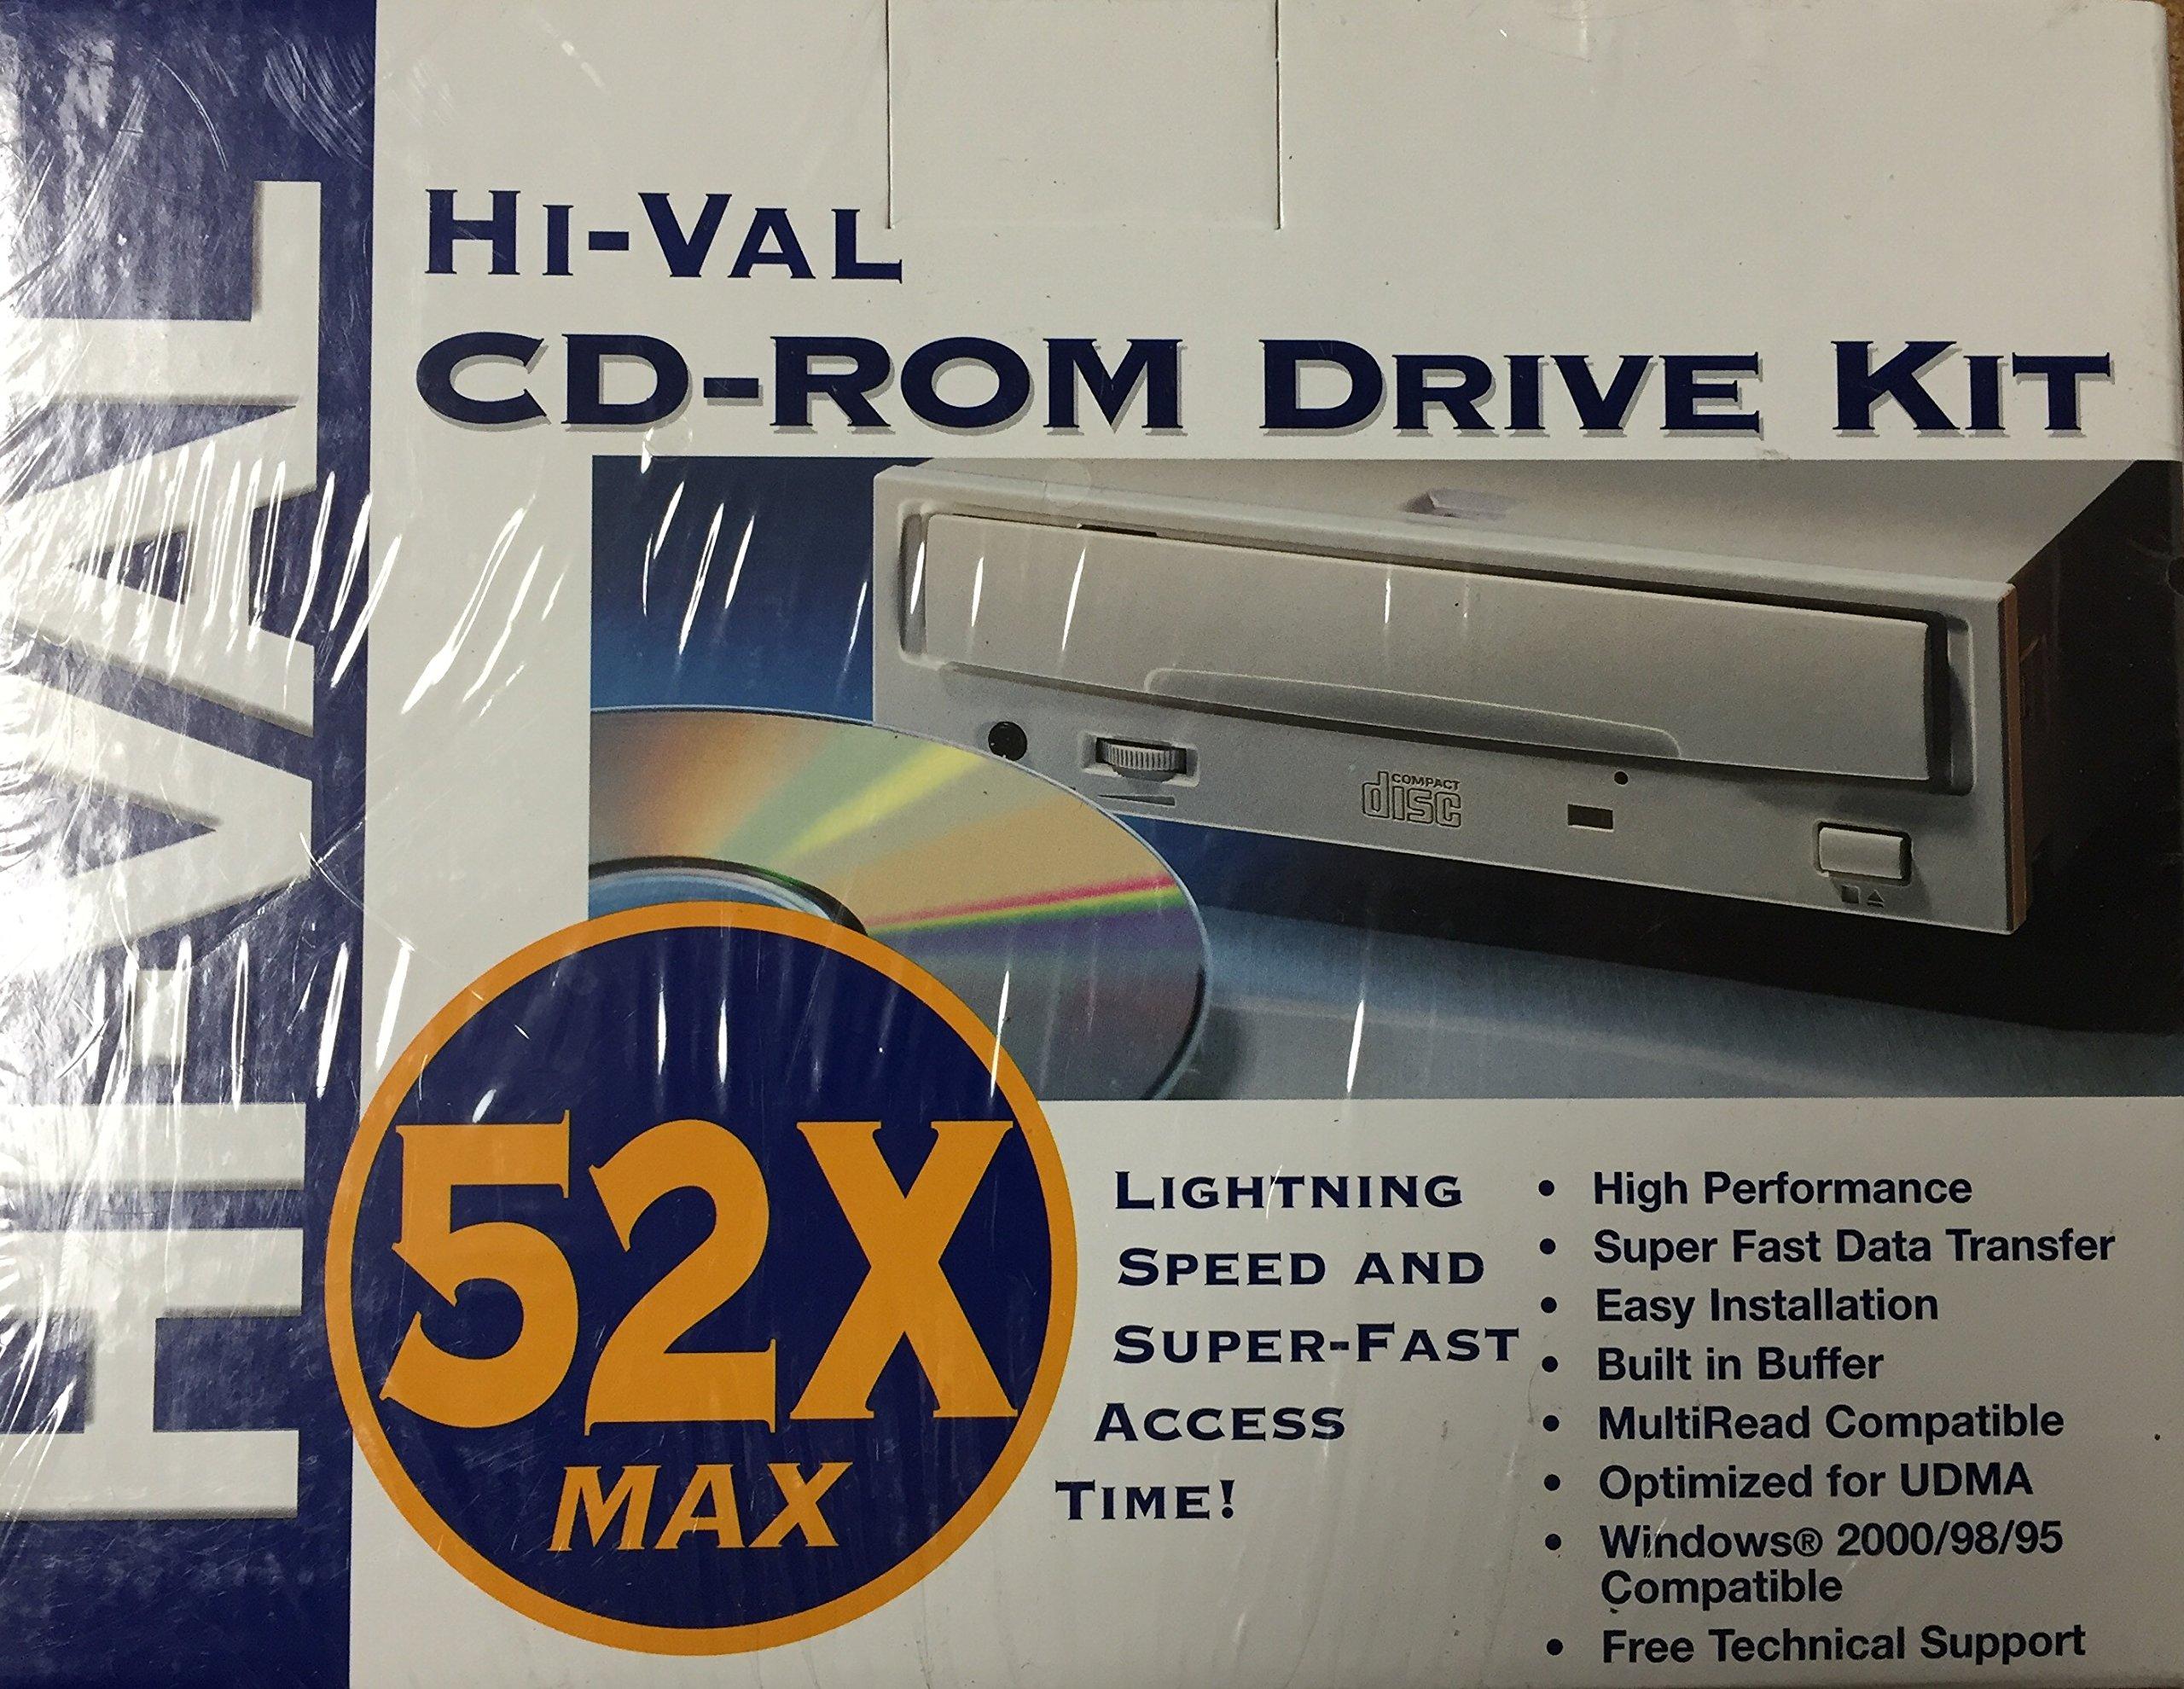 Hi-Val Multimedia Kit - Disk drive - CD-ROM - 52x - IDE - internal - 5.25'' - white